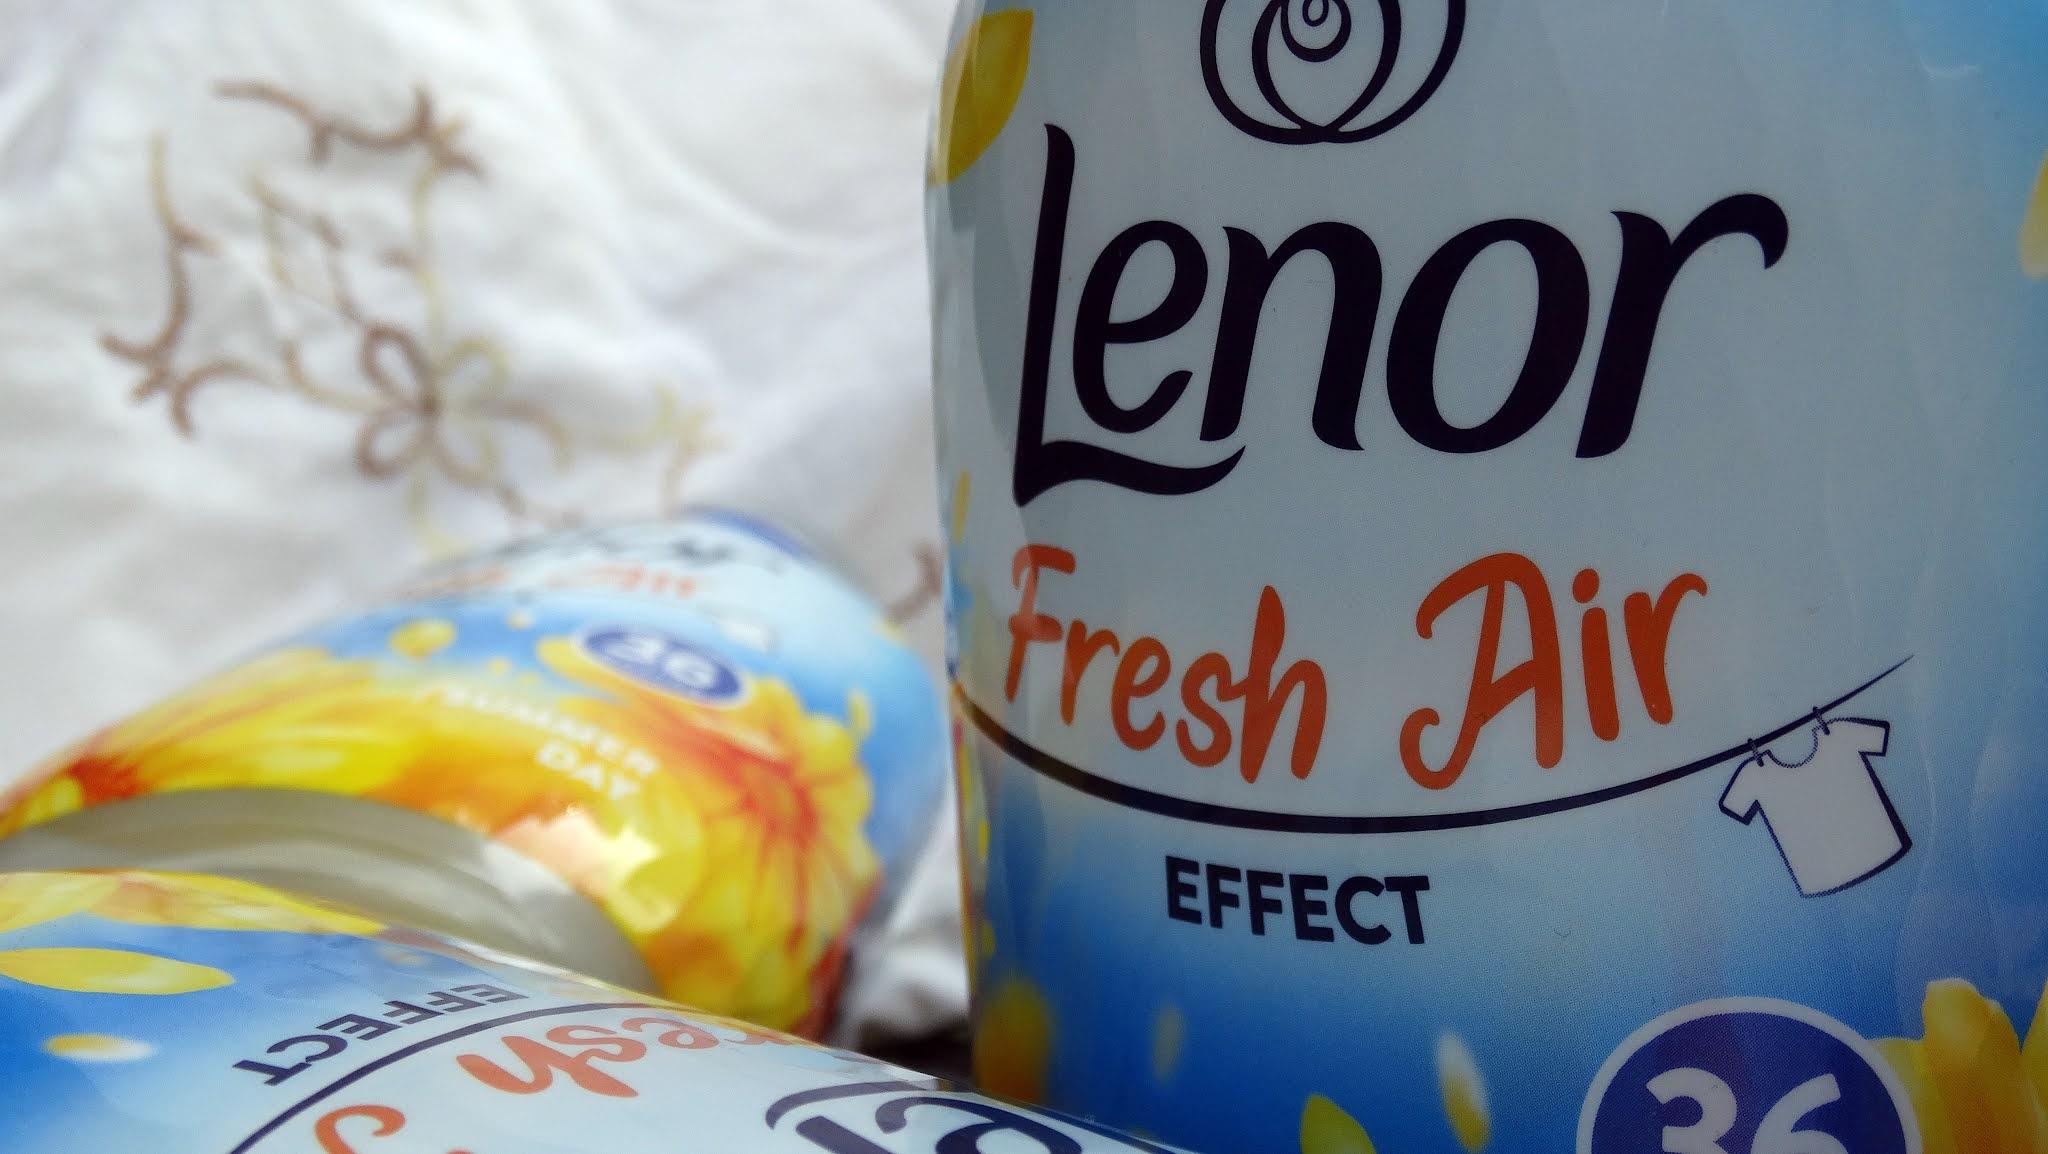 Lenor Fresh Air - opinia